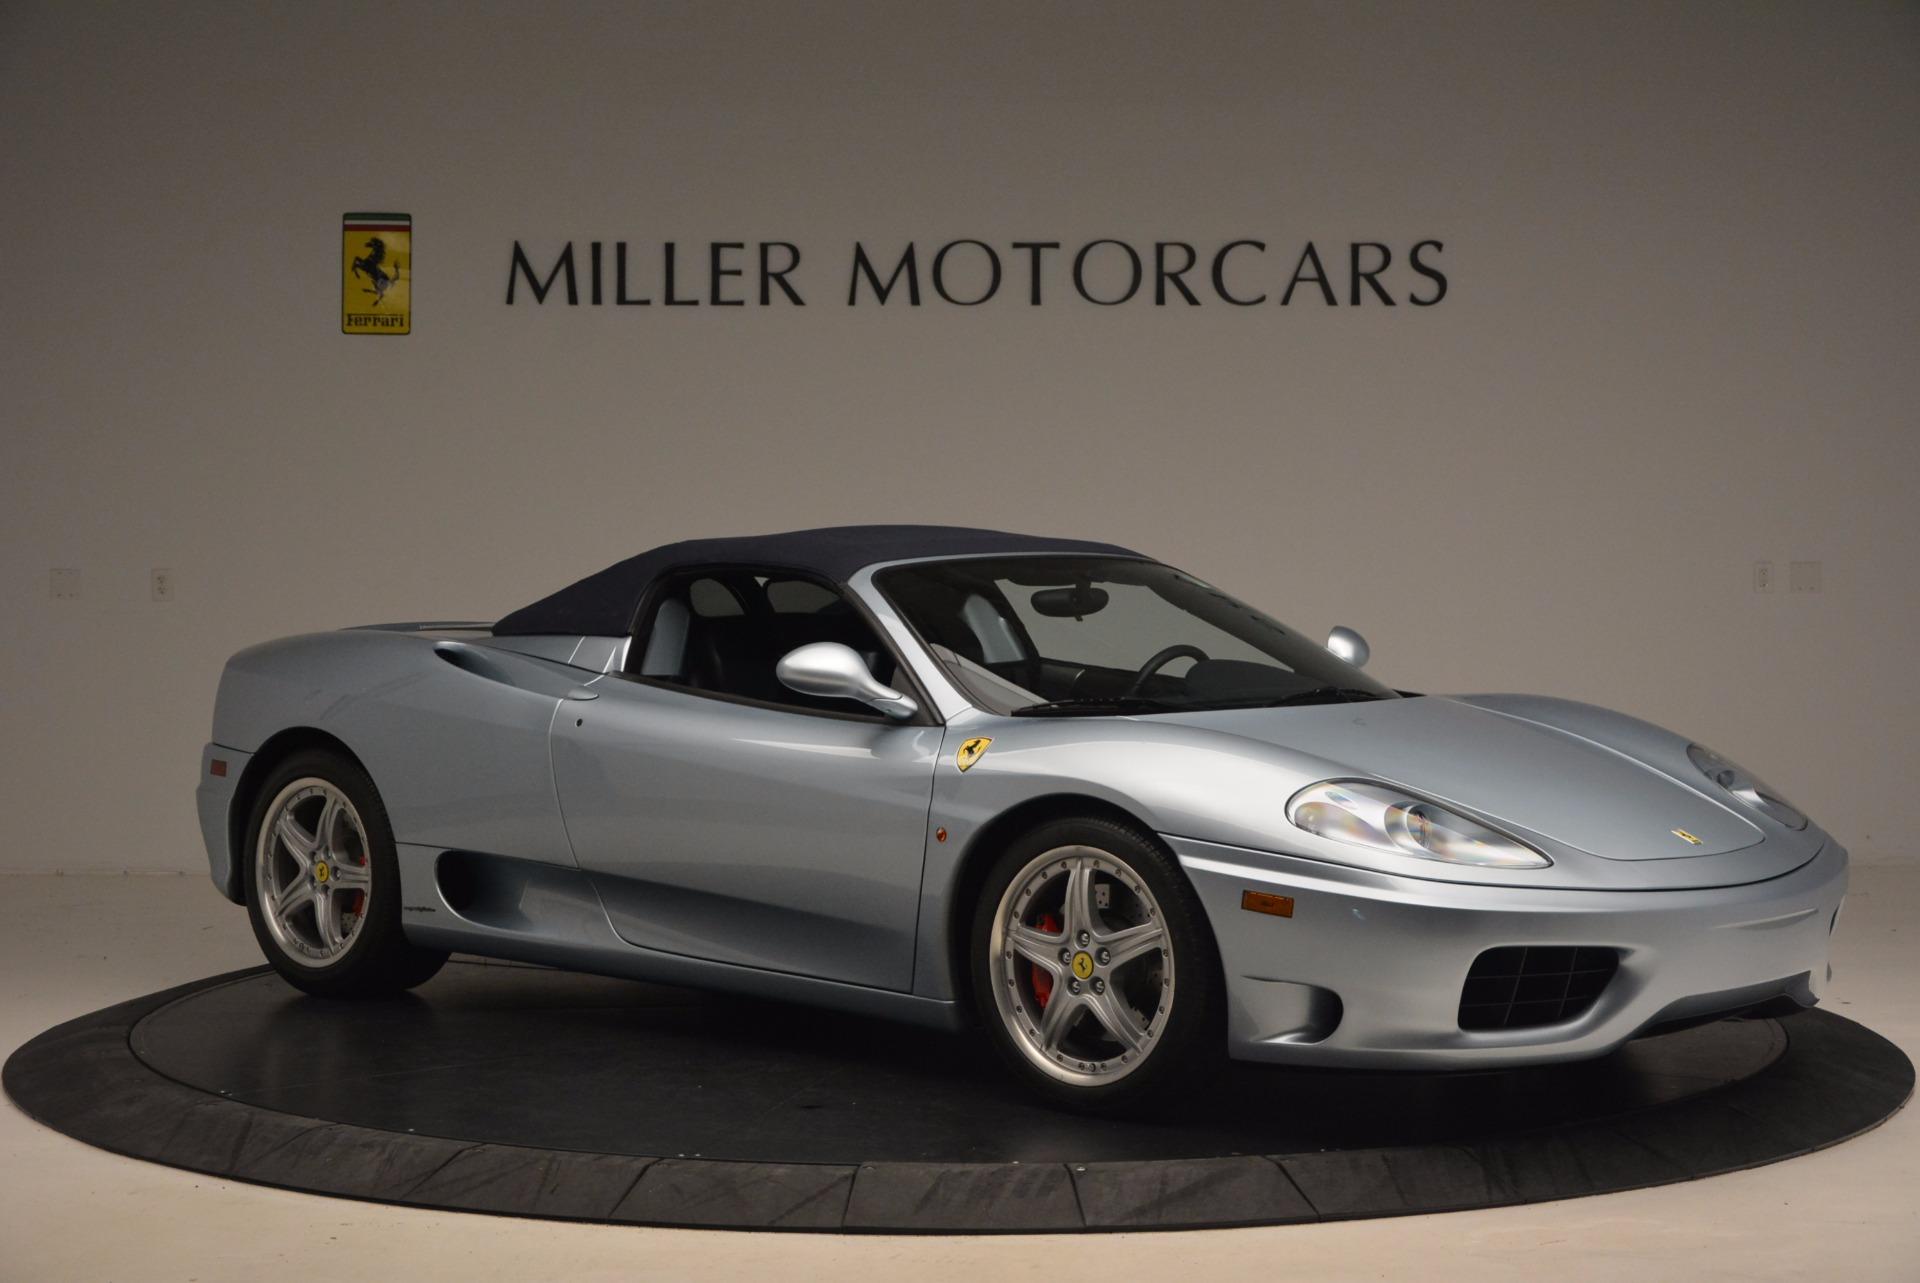 Used 2003 Ferrari 360 Spider 6-Speed Manual For Sale In Westport, CT 1445_p22